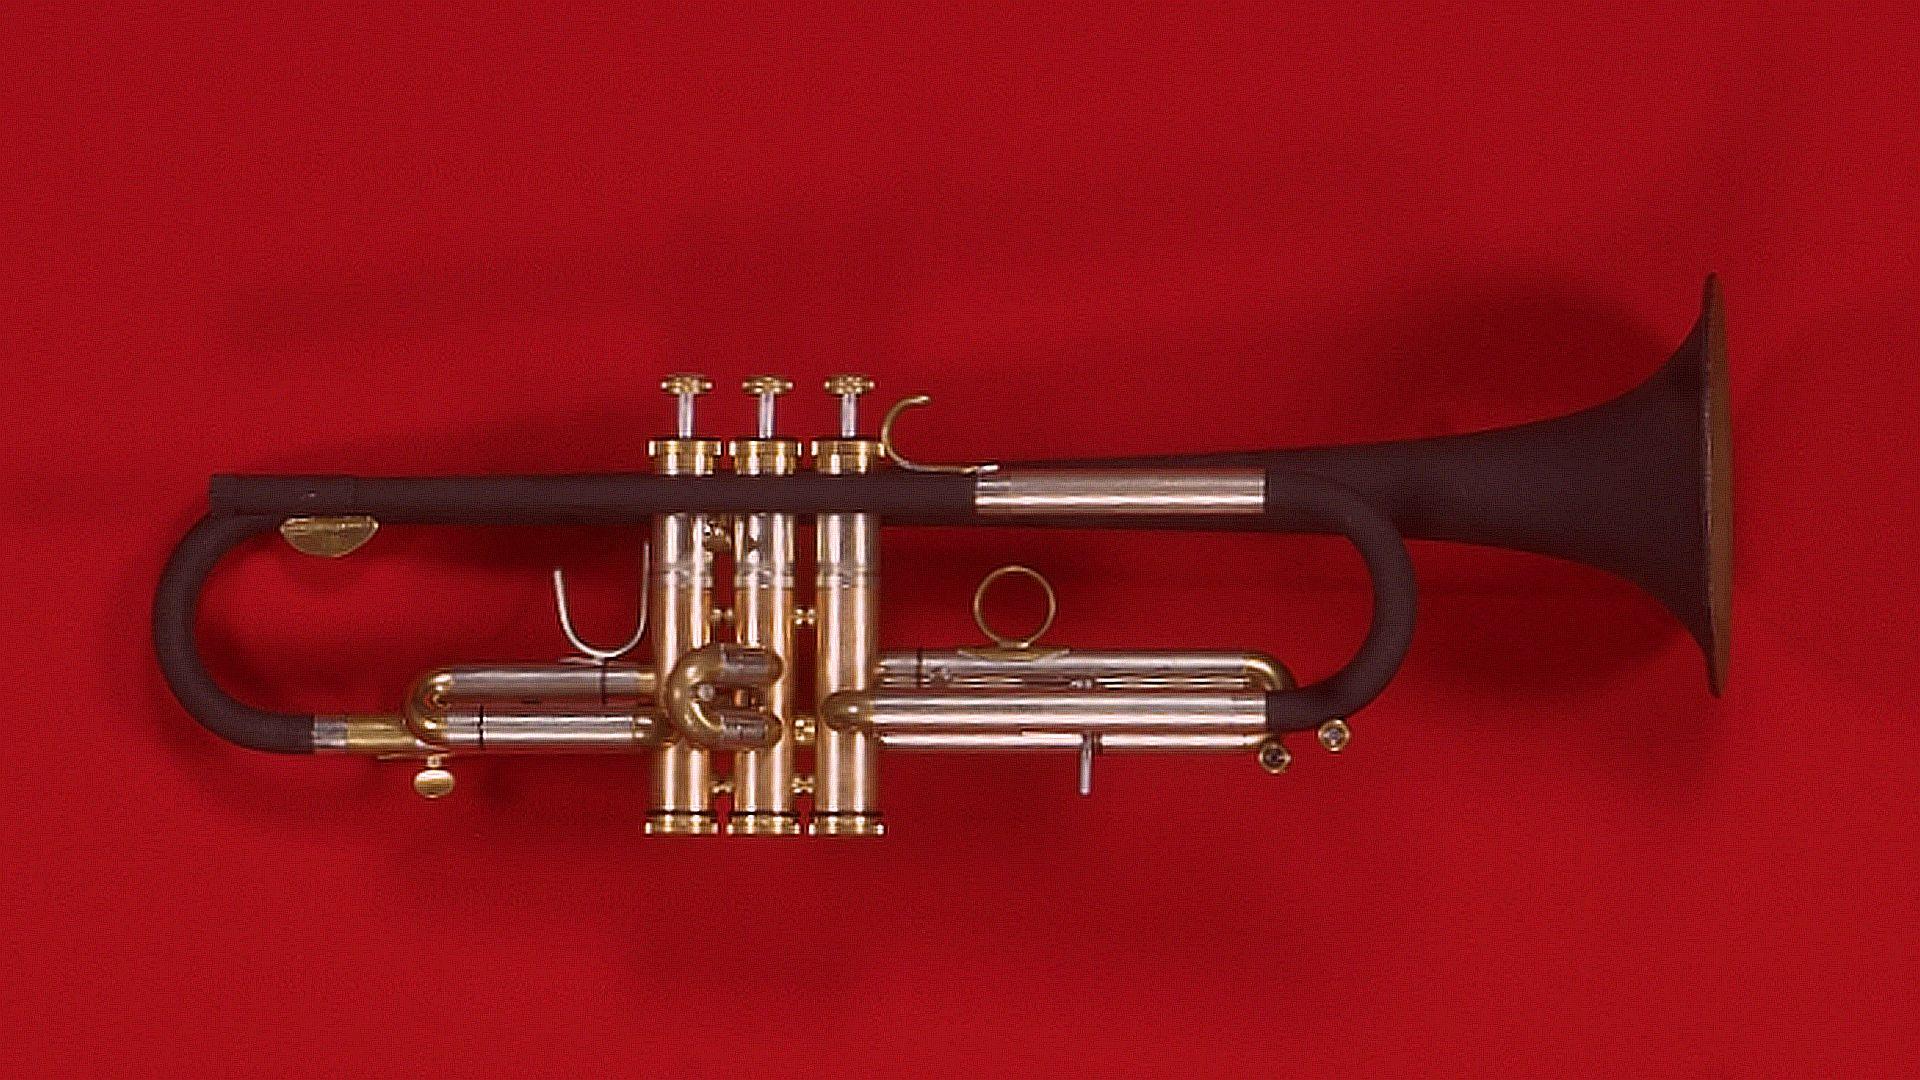 trompete_toro_1920x1080px